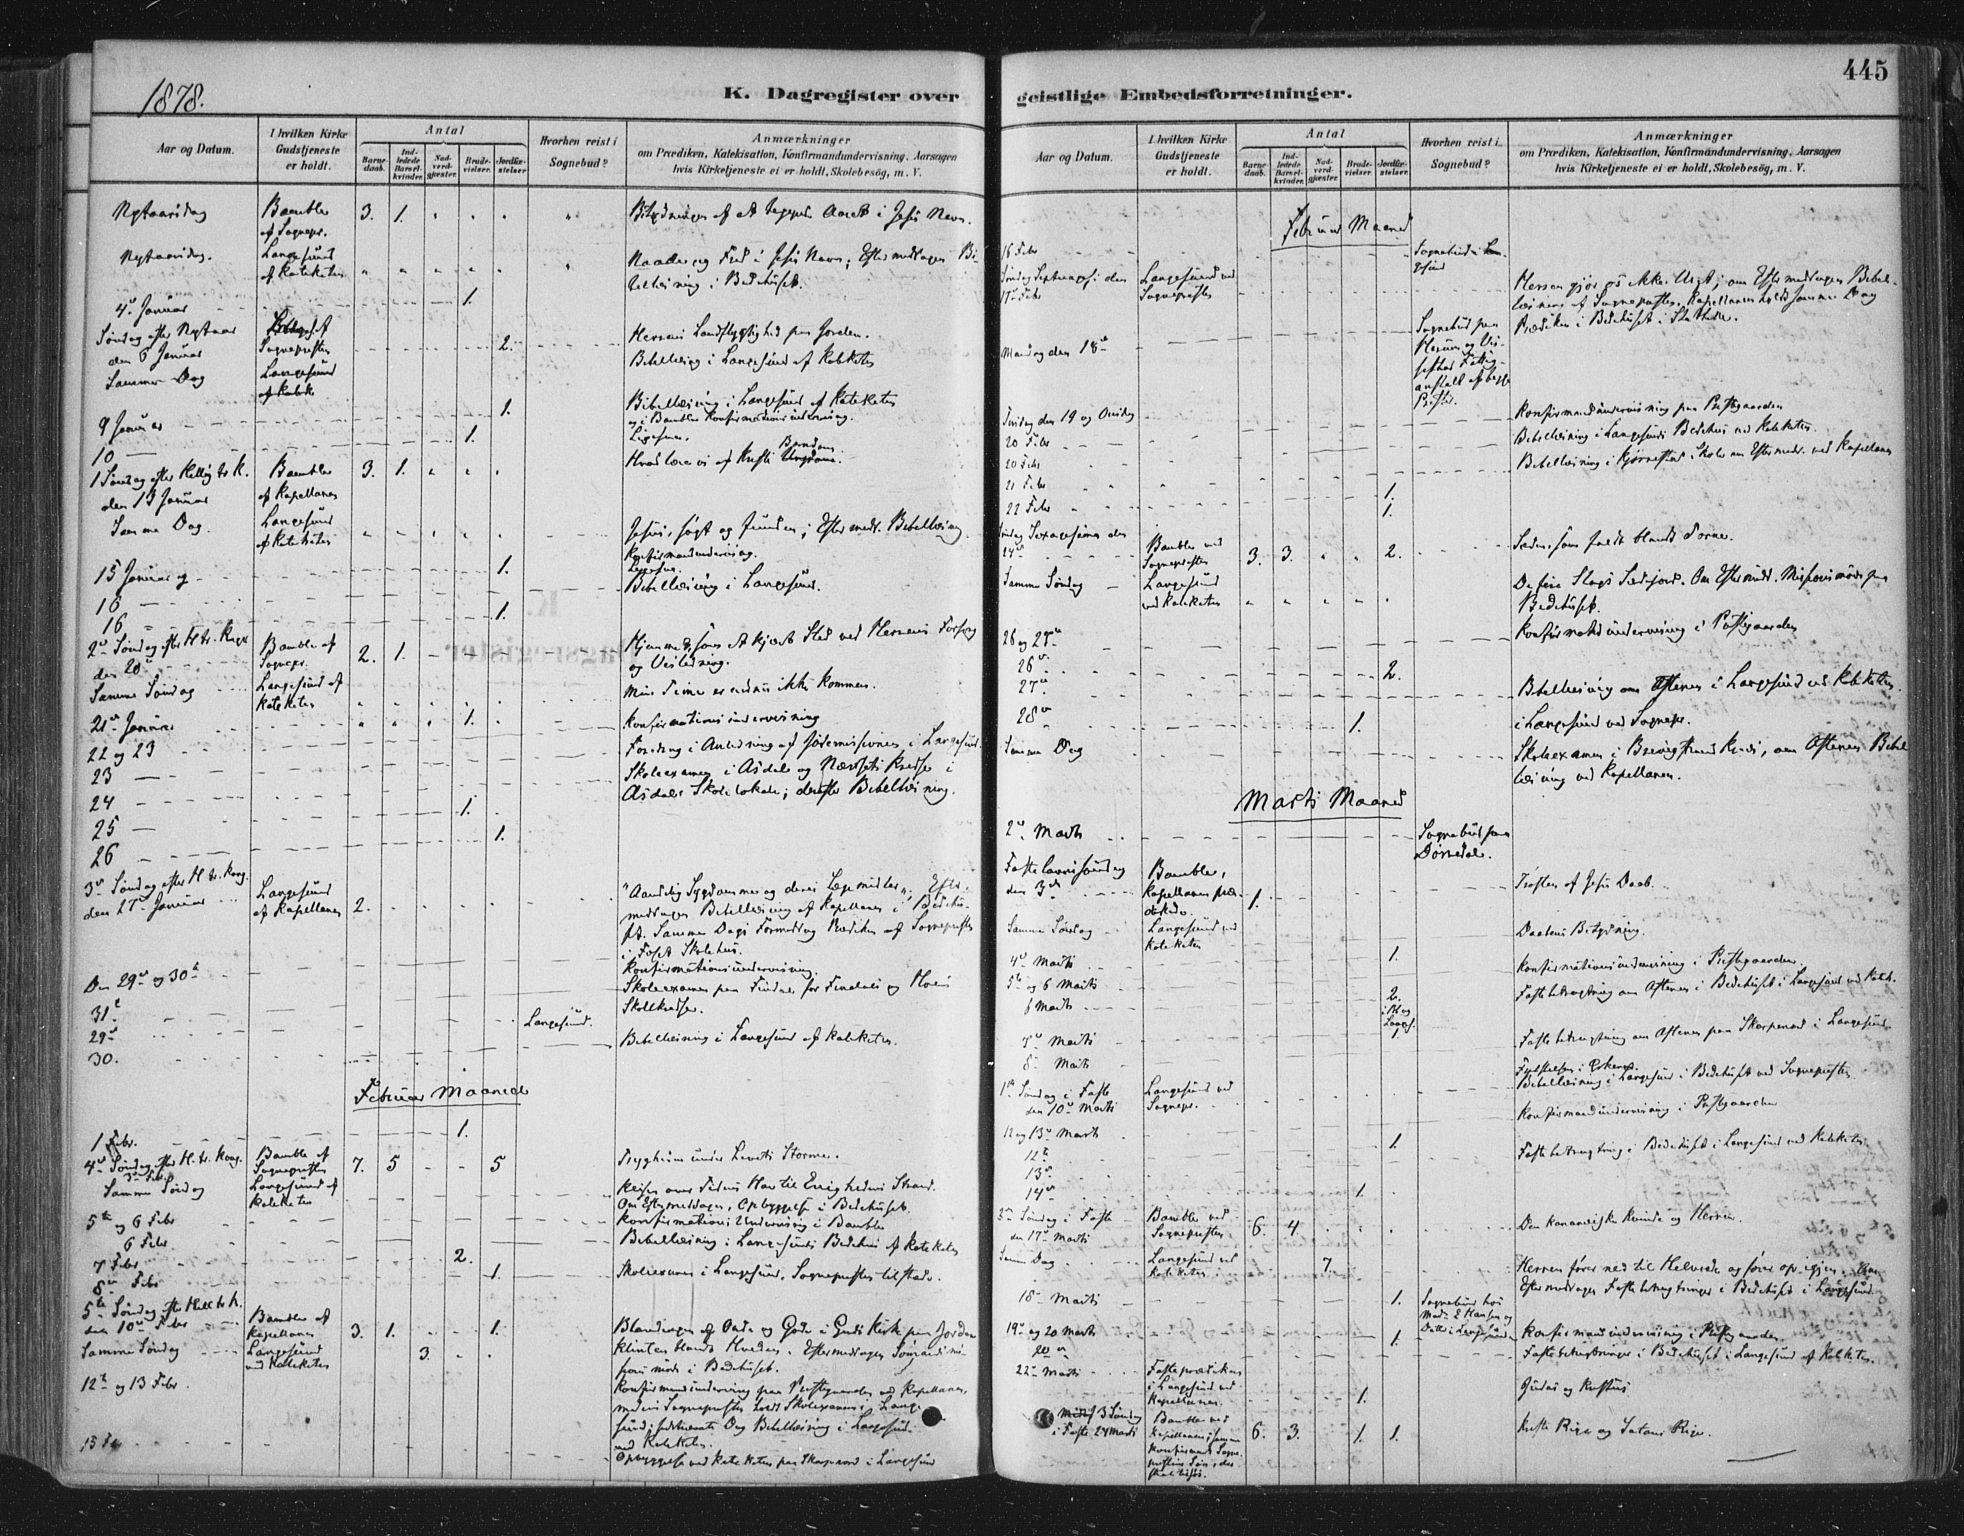 SAKO, Bamble kirkebøker, F/Fa/L0007: Ministerialbok nr. I 7, 1878-1888, s. 445